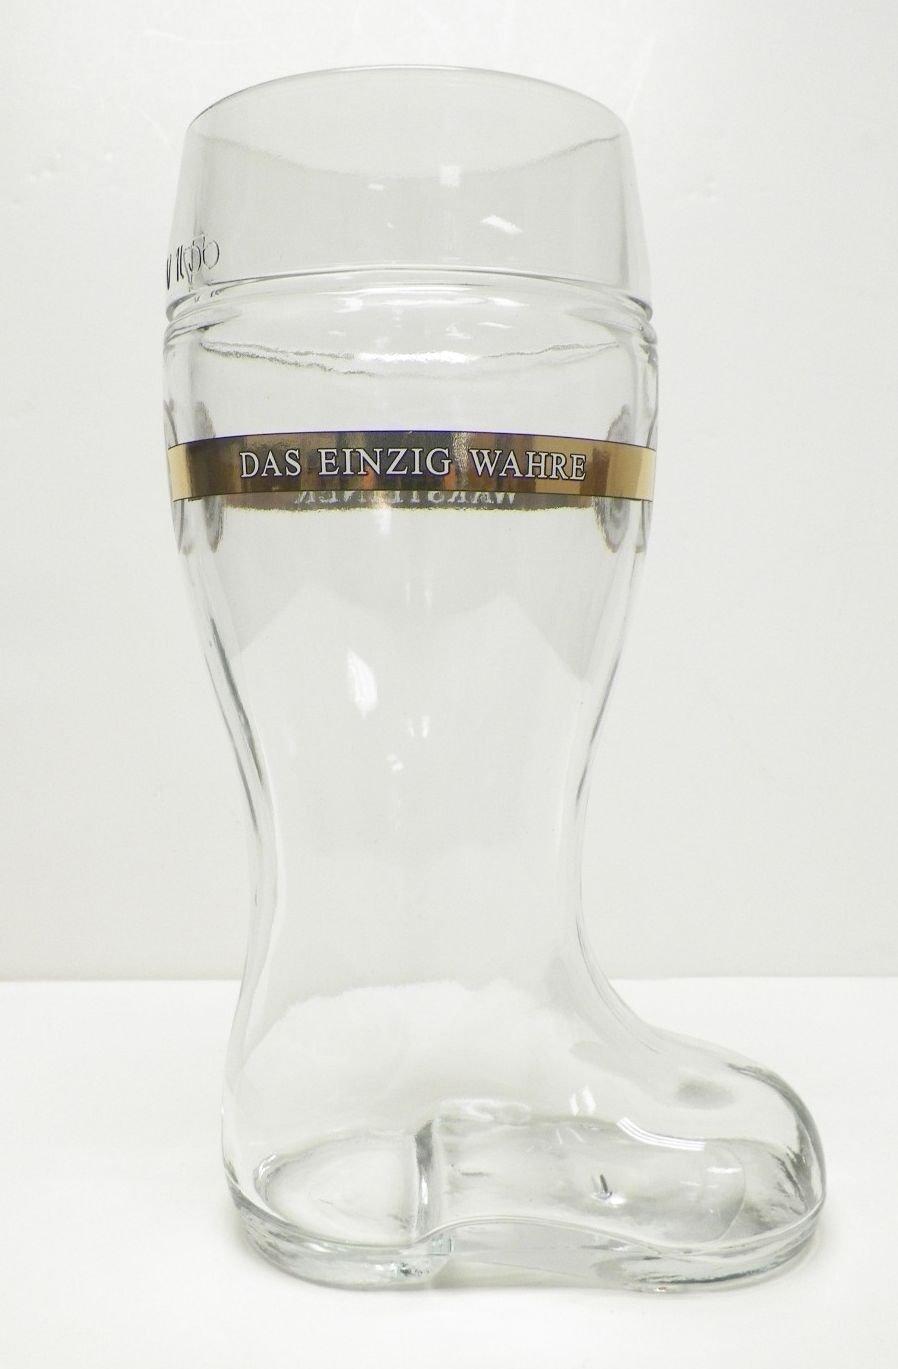 Warsteiner German Beer Boot Glass 1 Liter